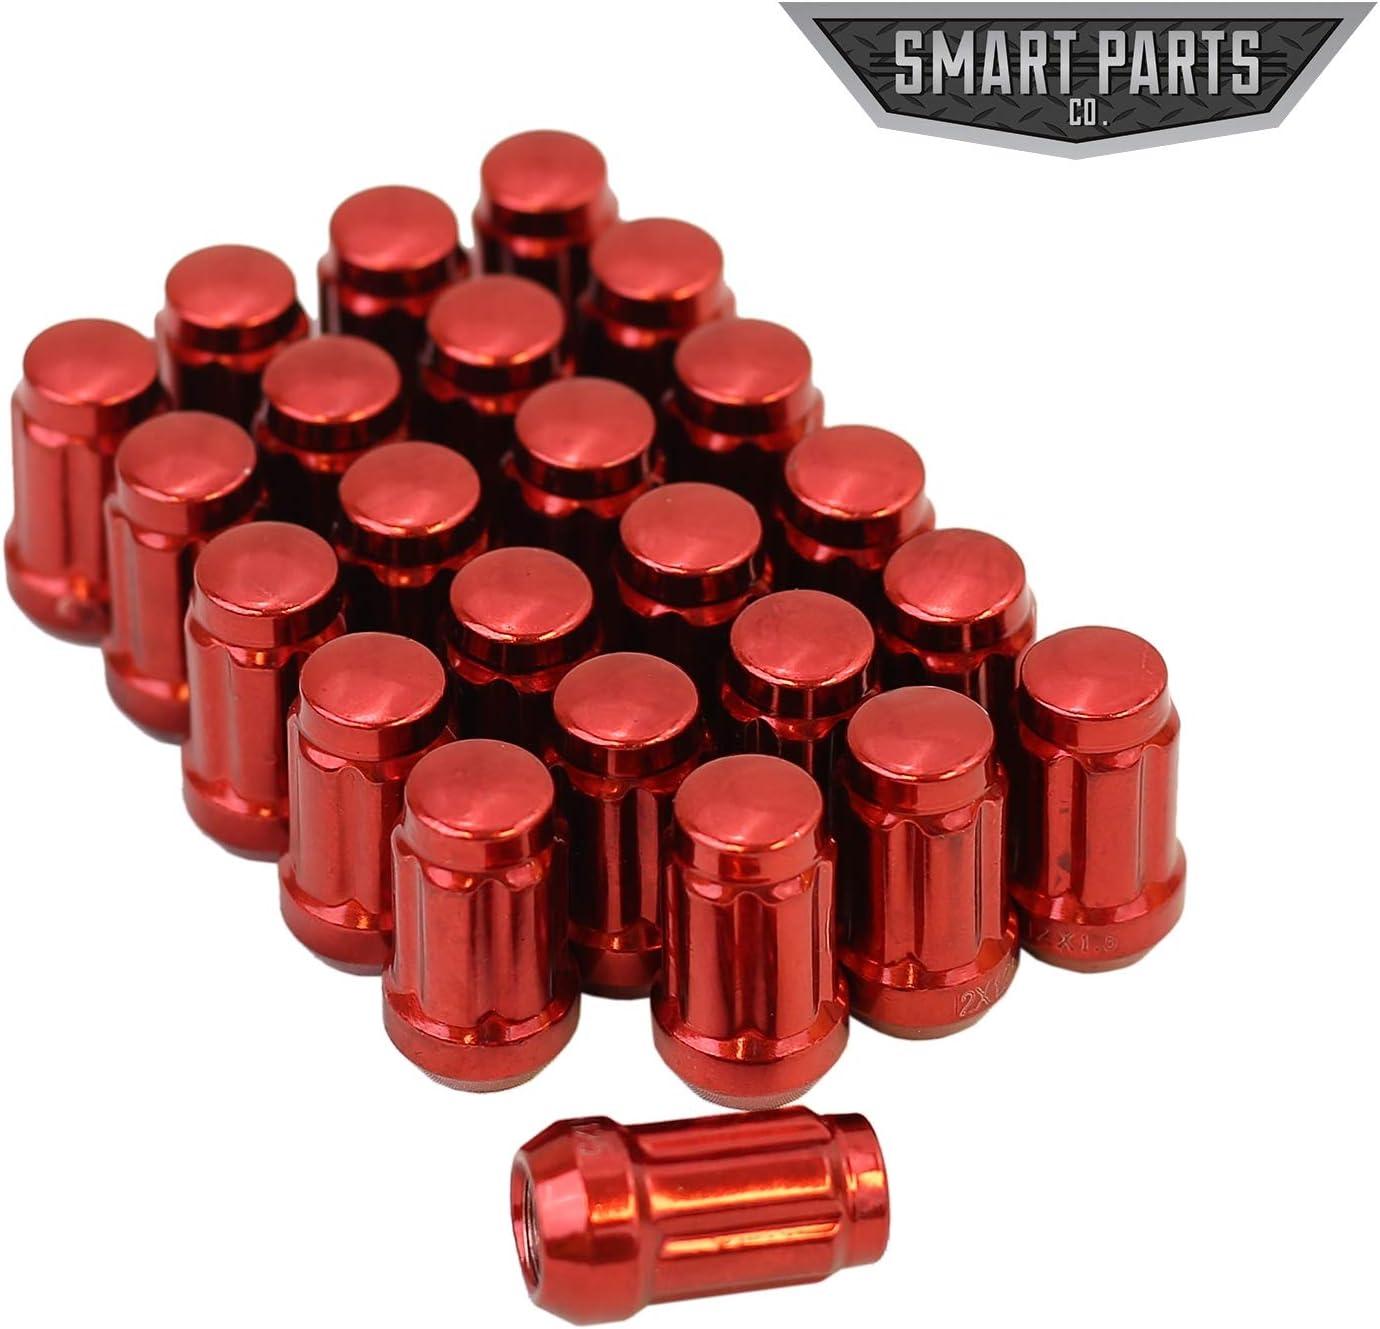 Smart Parts 24 12x1.5 Neo Chrome Closed End Acorn Spline Lug Nuts Cone Seat W//Key 1.4 Long